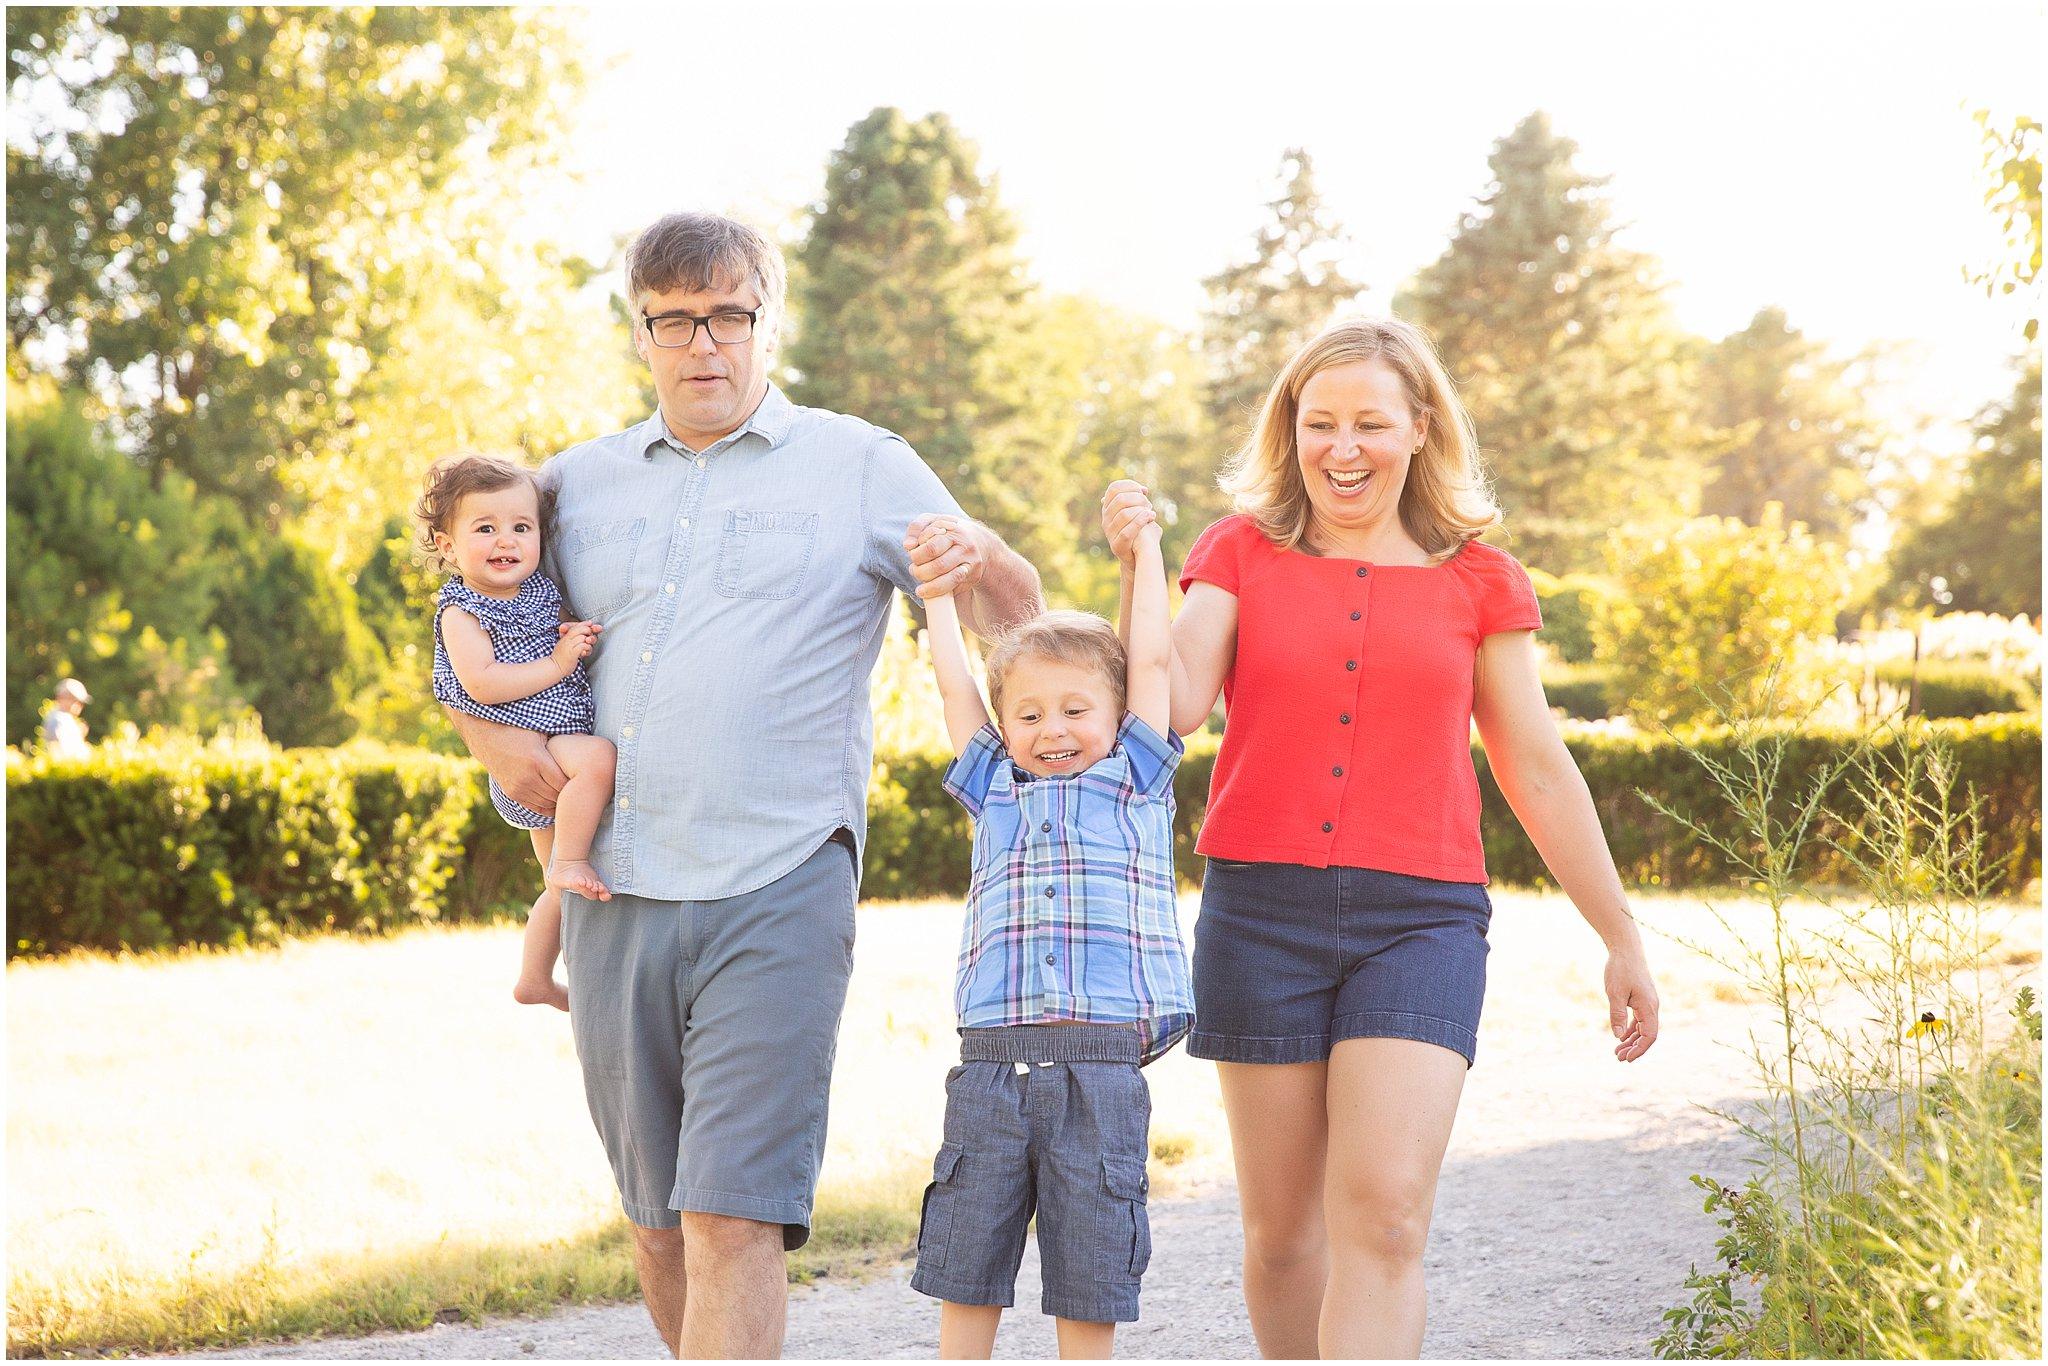 Ann Arbor Family Photographer   Summer Photos at Matthaei